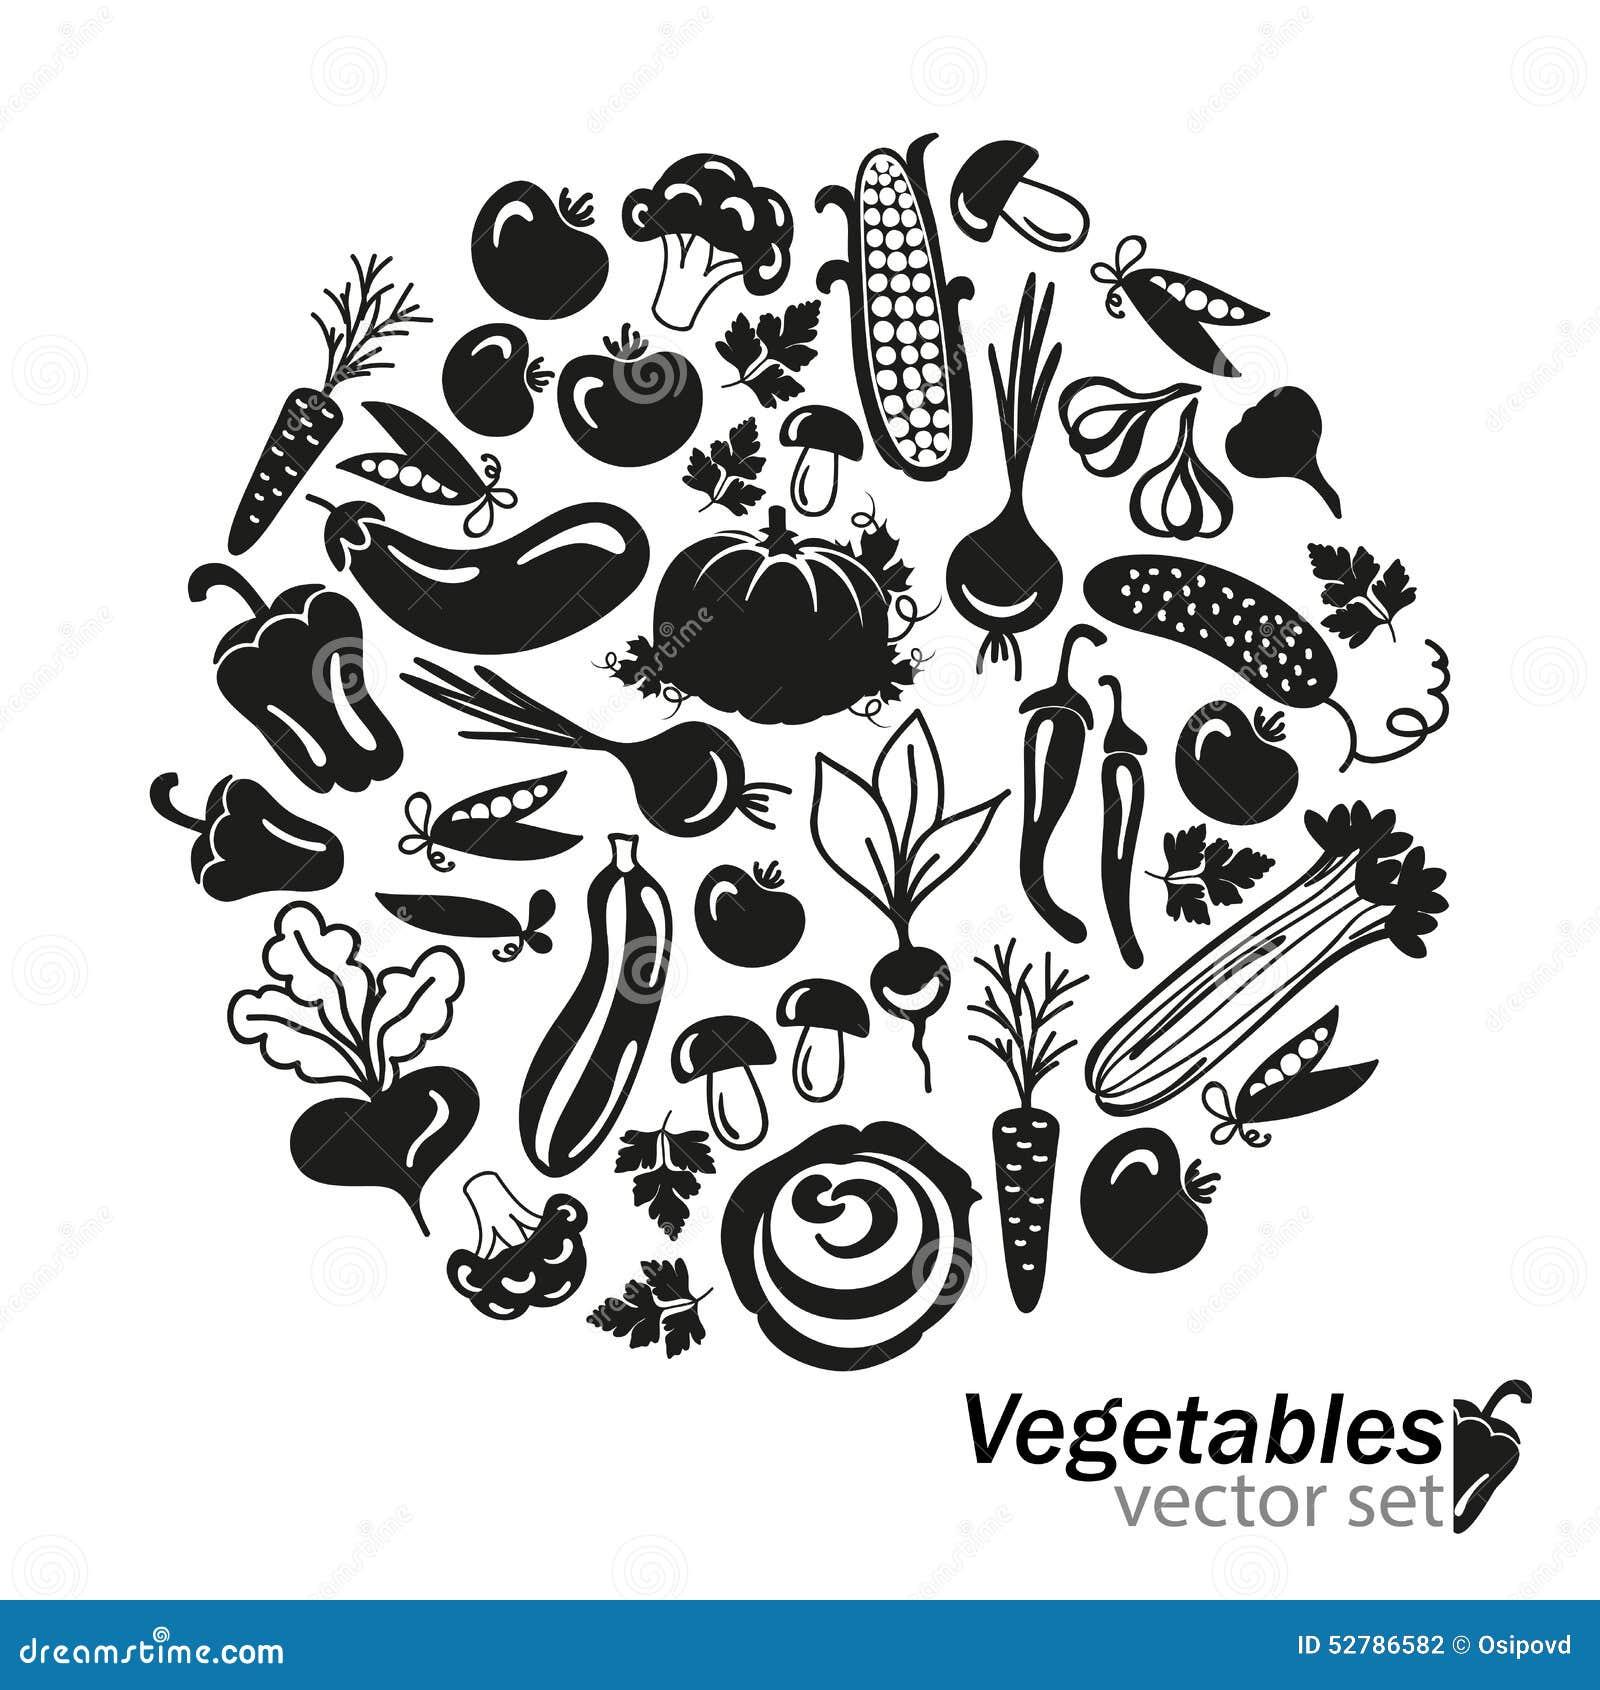 Vegetables Vector Black Icons On White Background Stock